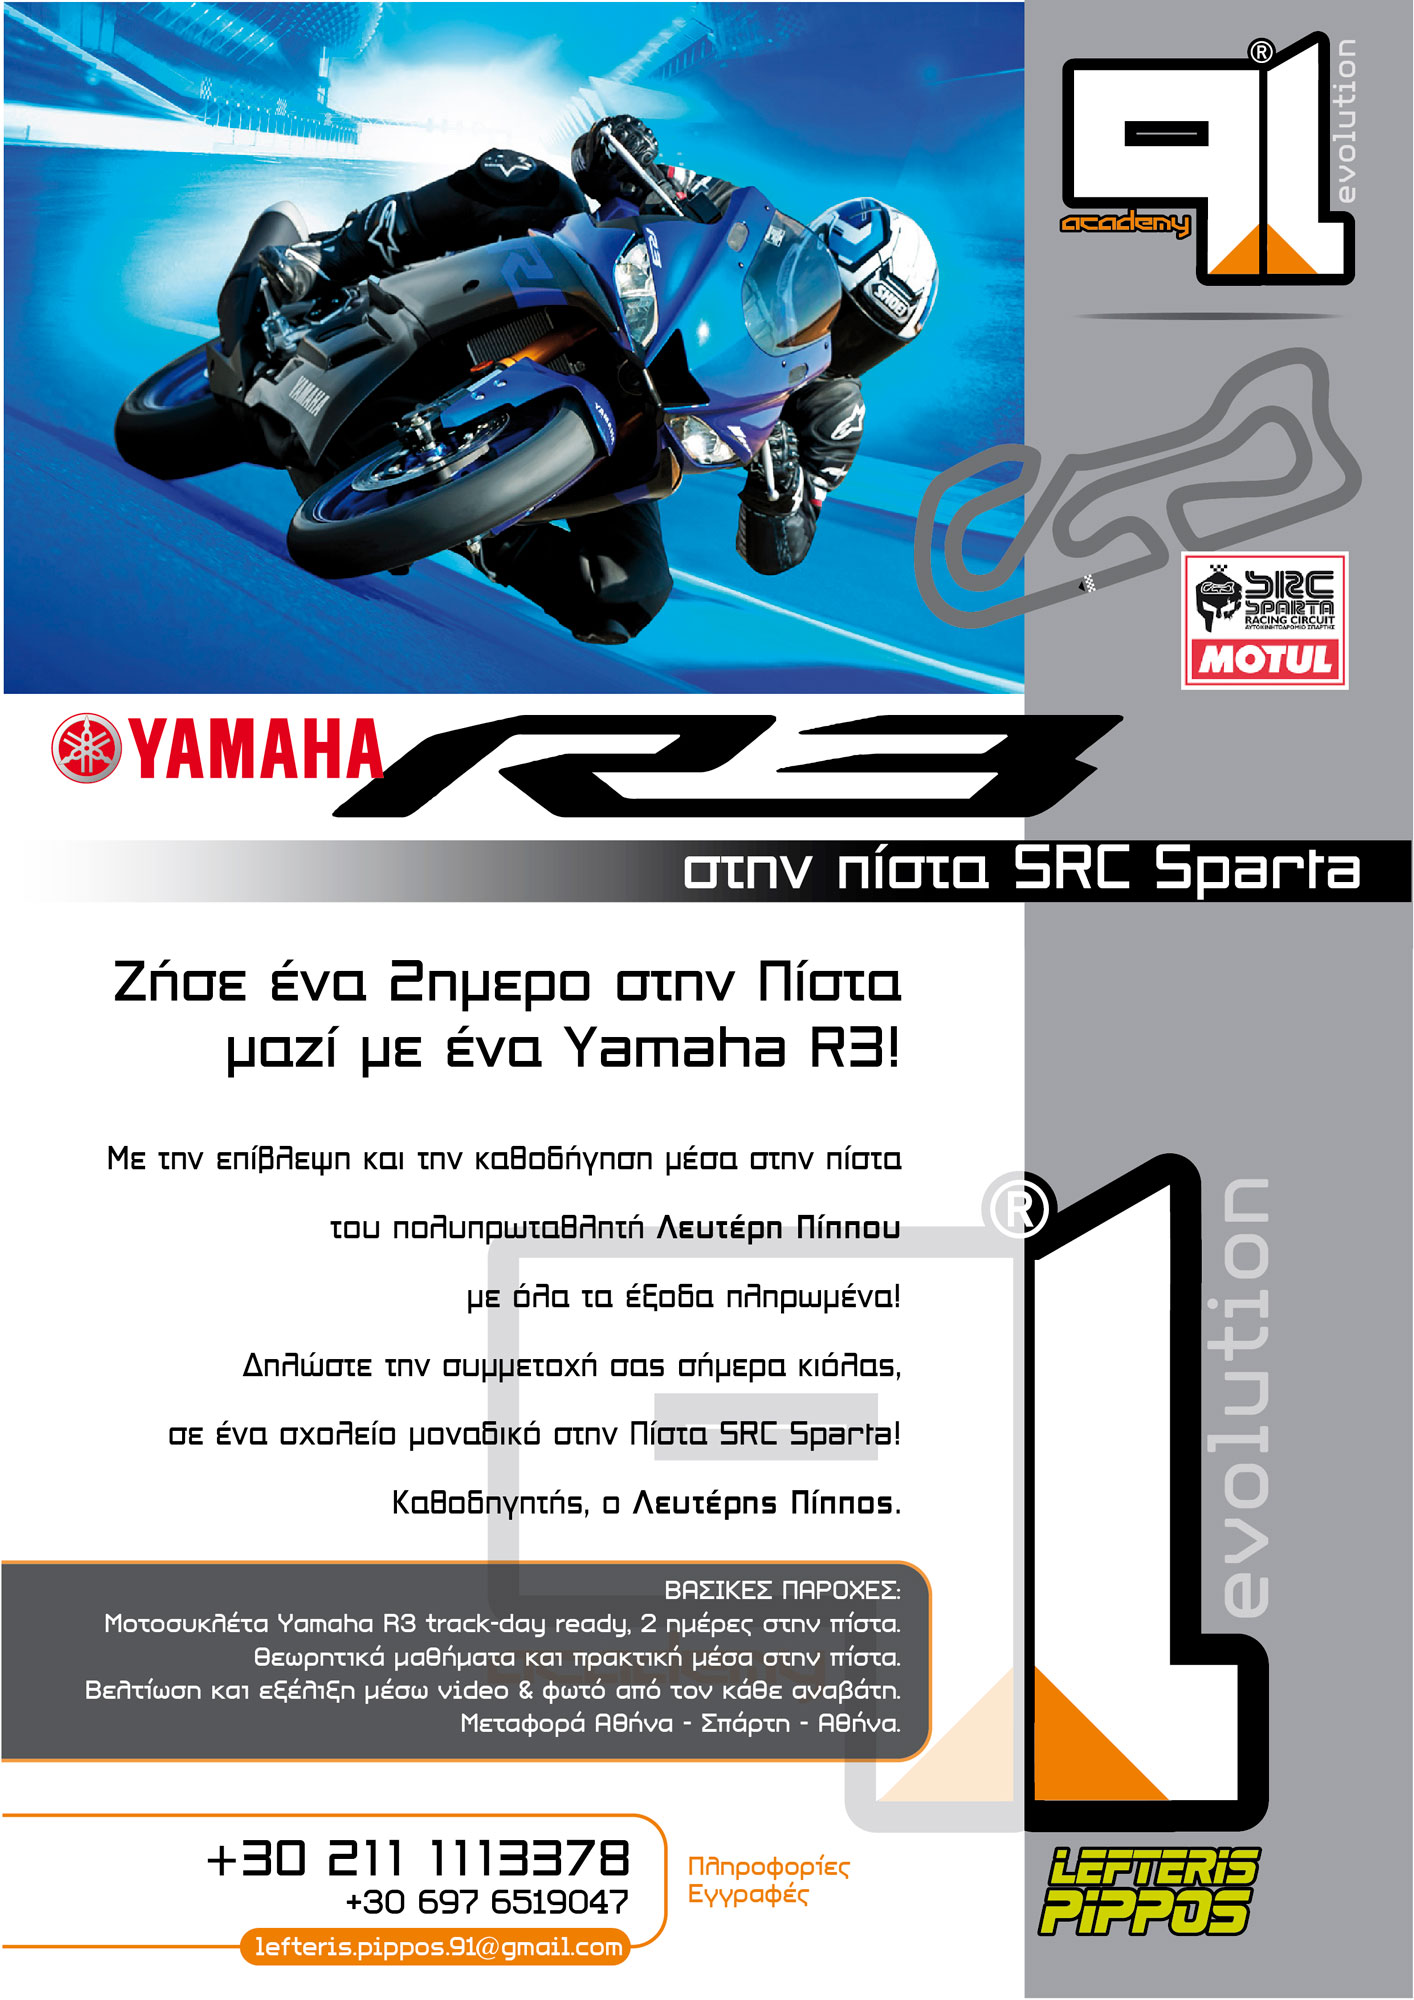 Yamaha R3 στην πίστα SRC